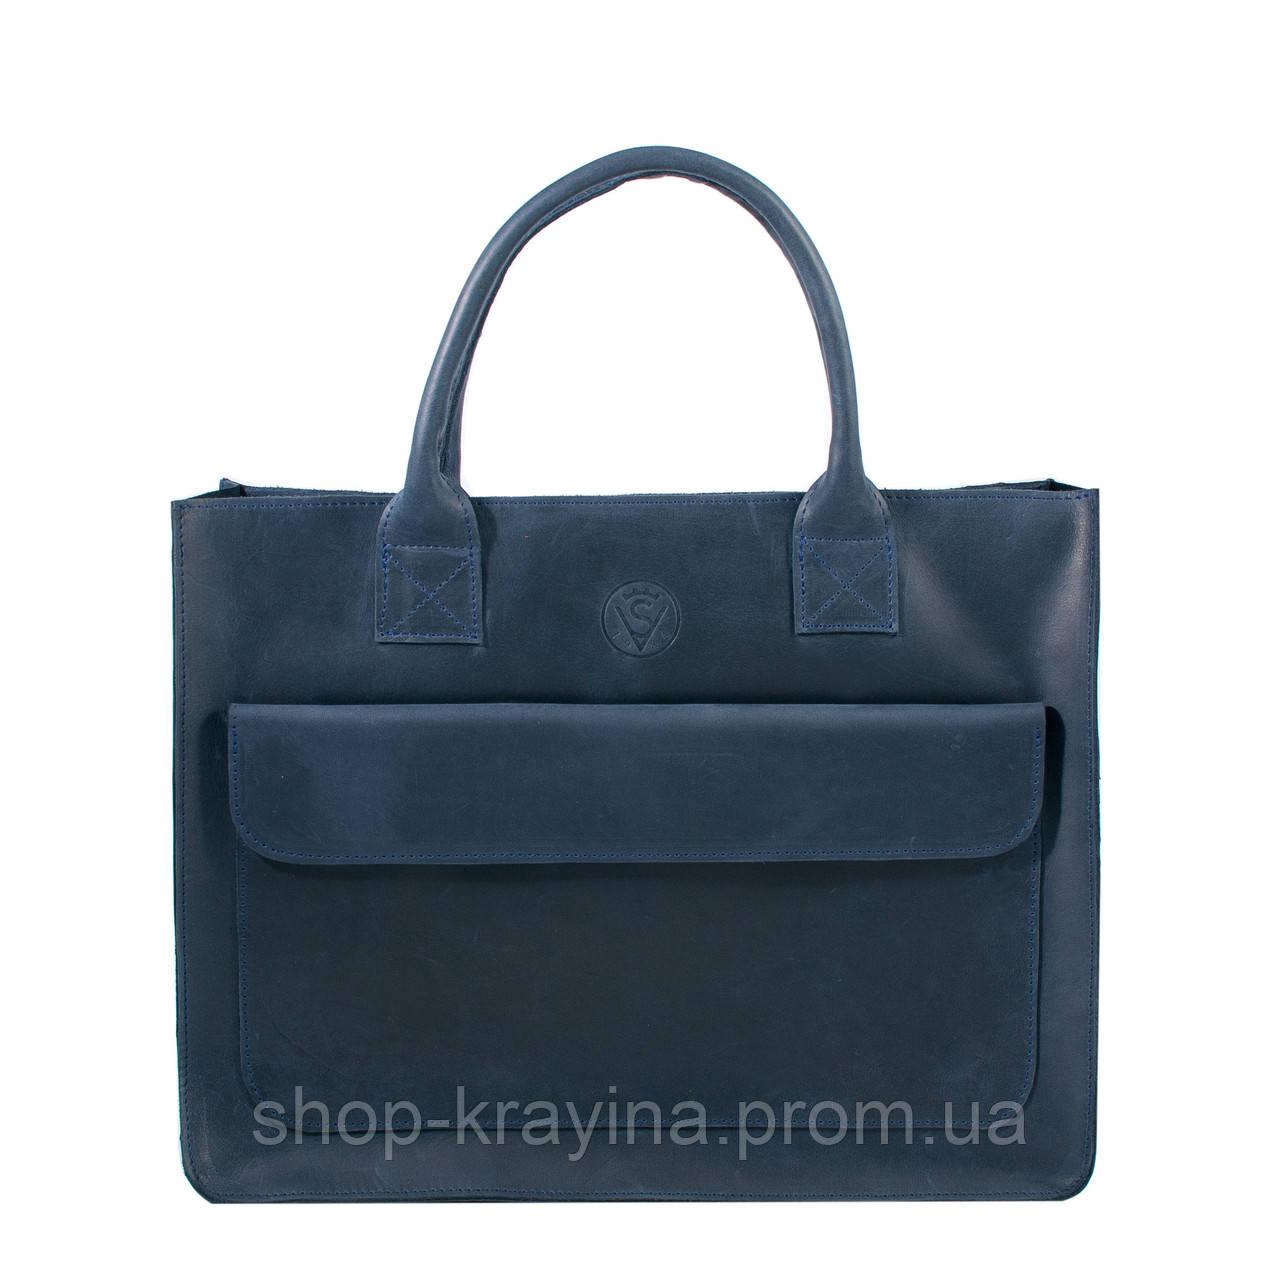 Портфель для документов VS231 blue  35х27х9 см